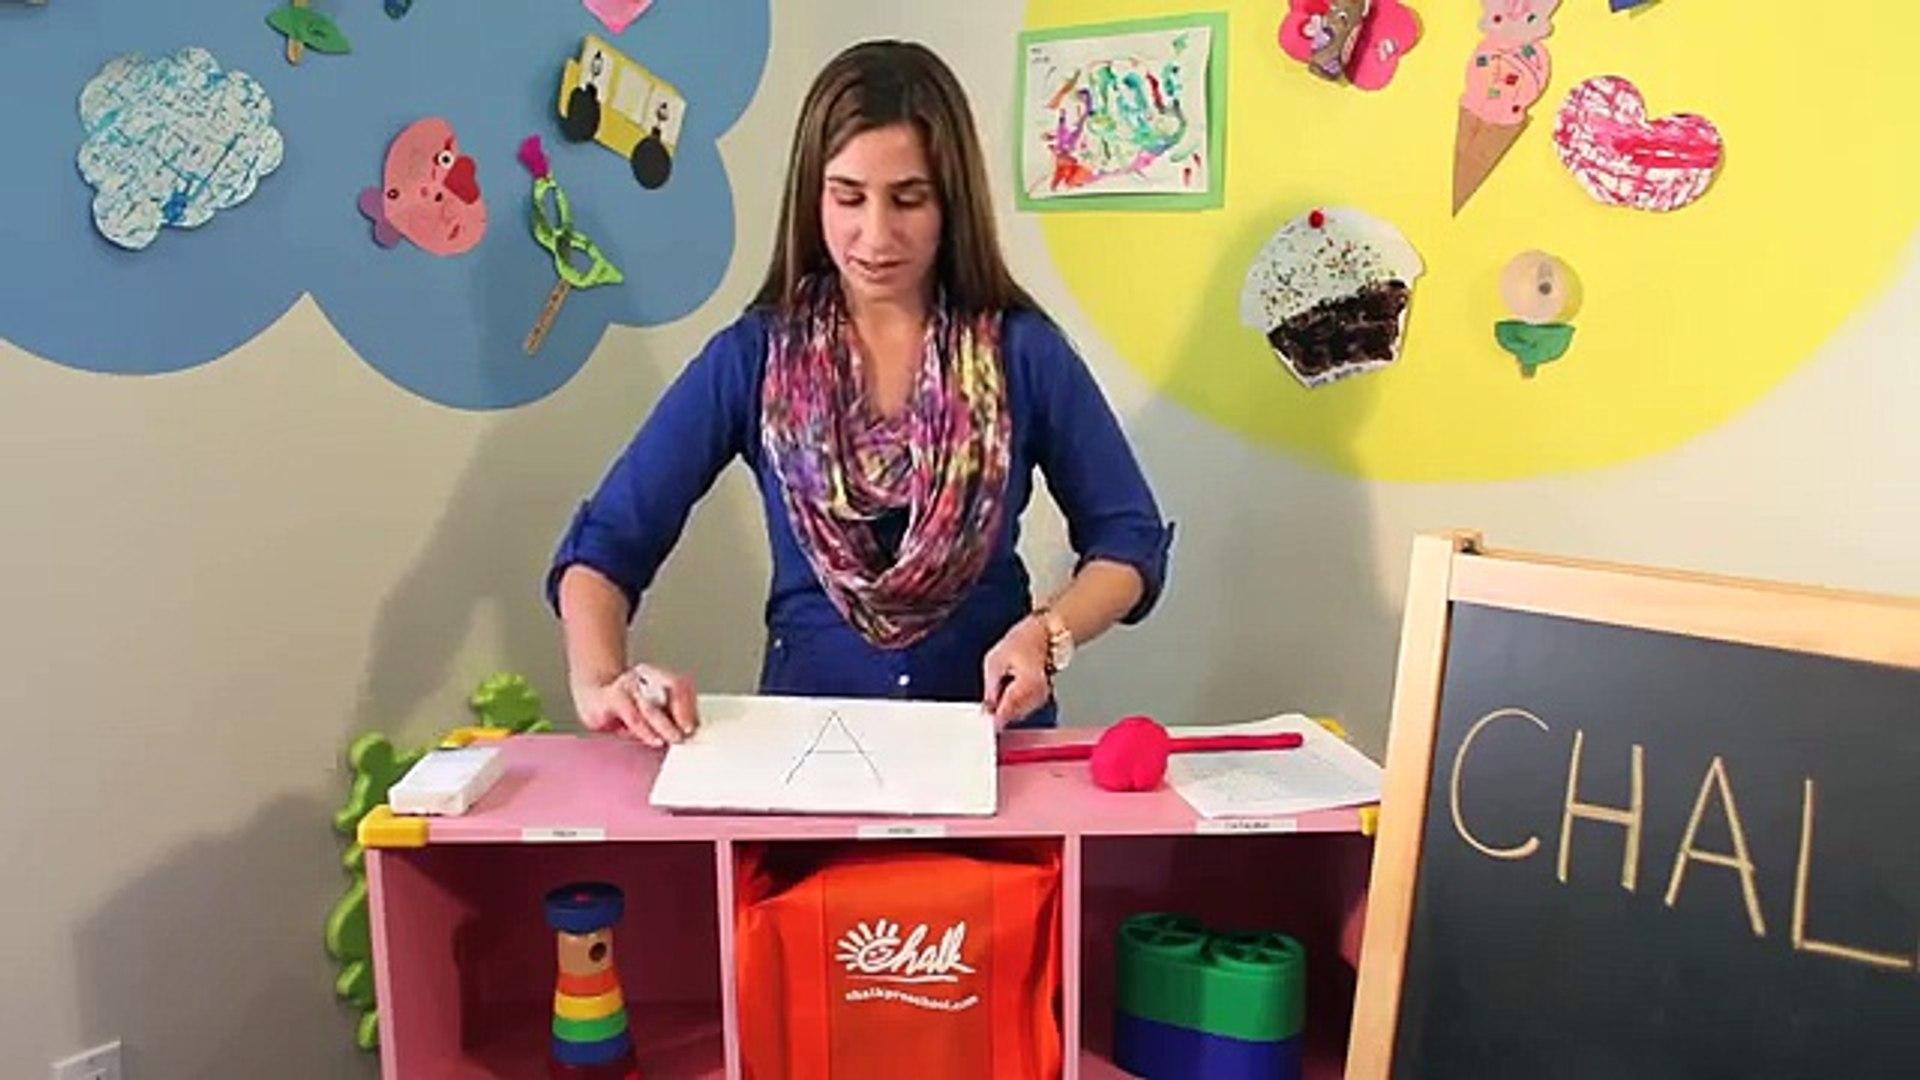 Kids Education - Nursery Writing Activities During Preschool Lessons